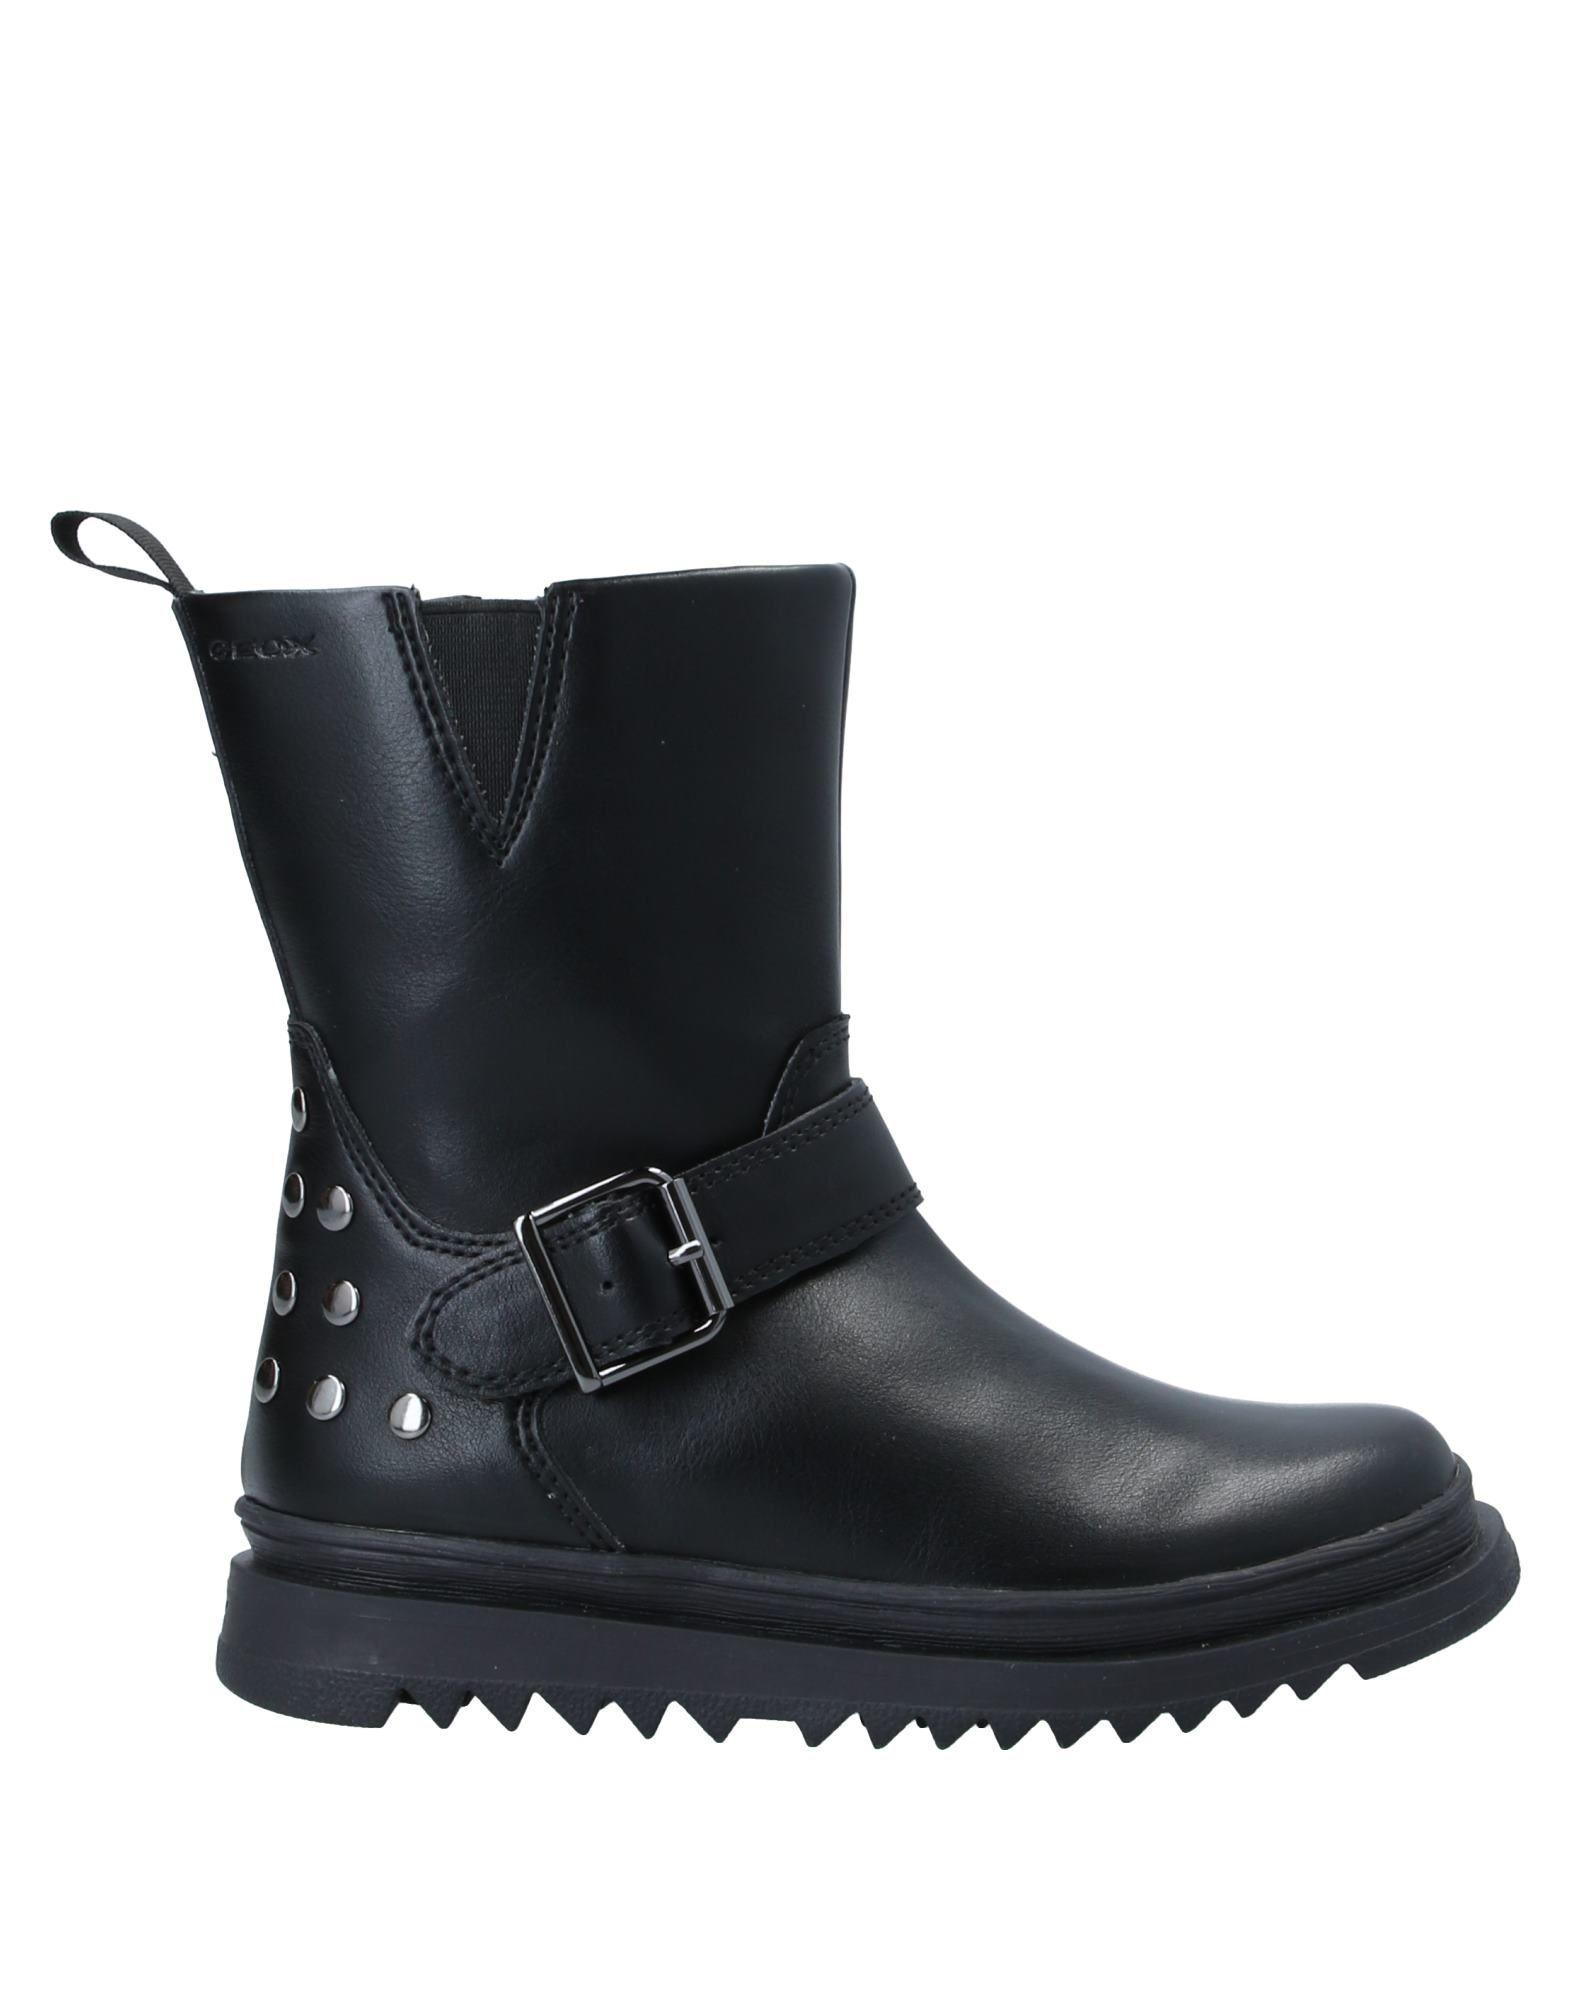 Salida hacia Pila de controlador  GEOX GEOX Ankle boots from yoox.com   SheFinds